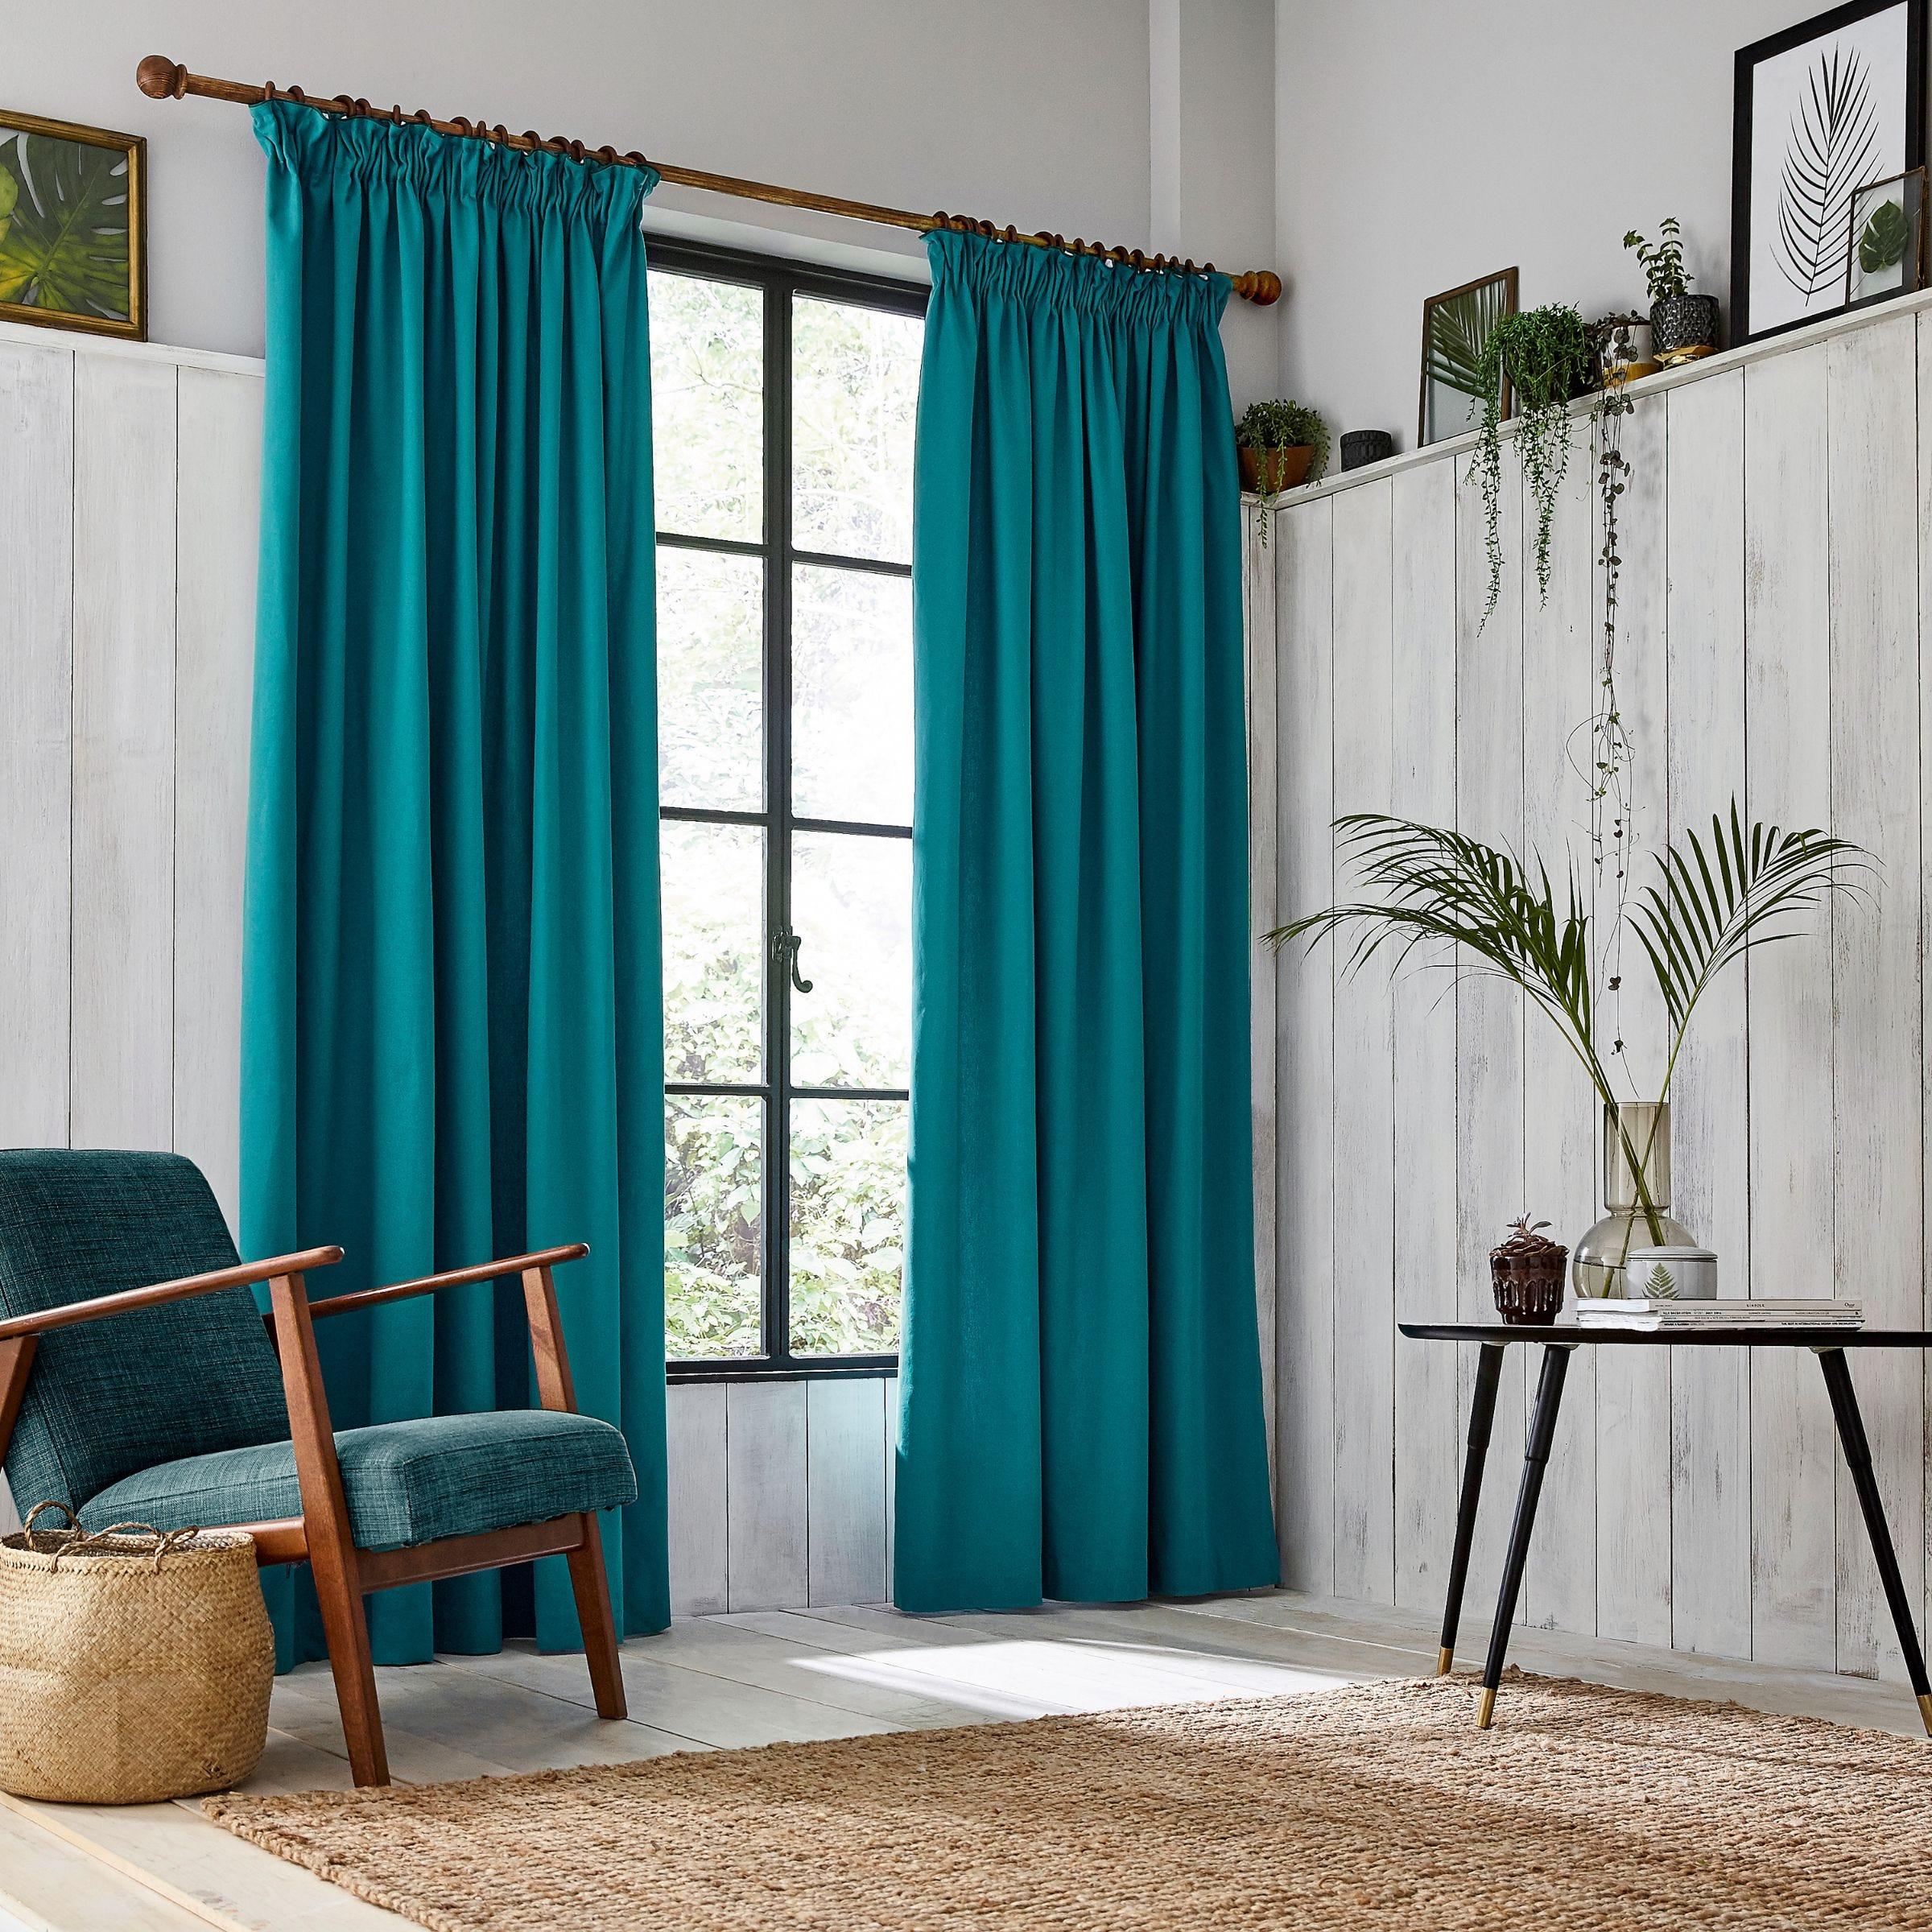 "Clarissa Hulse Chroma Lined Curtains 66"" x 90"", Teal"